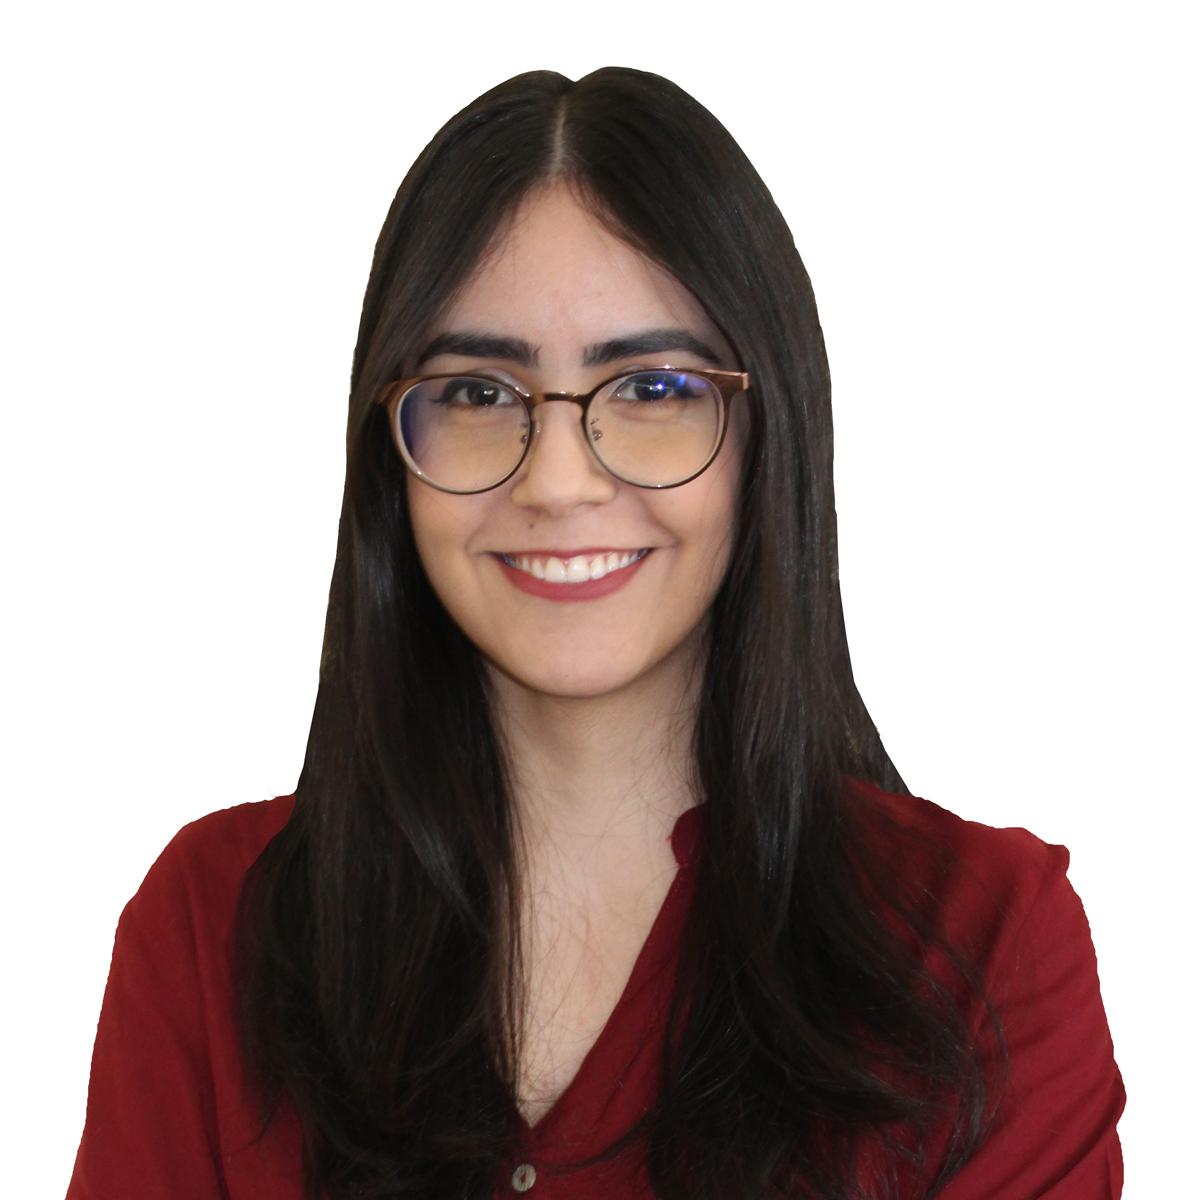 Maria Carolina - Marketing Técnico Imagem Esri - Autora Portal GEO - Autora ArcGIS